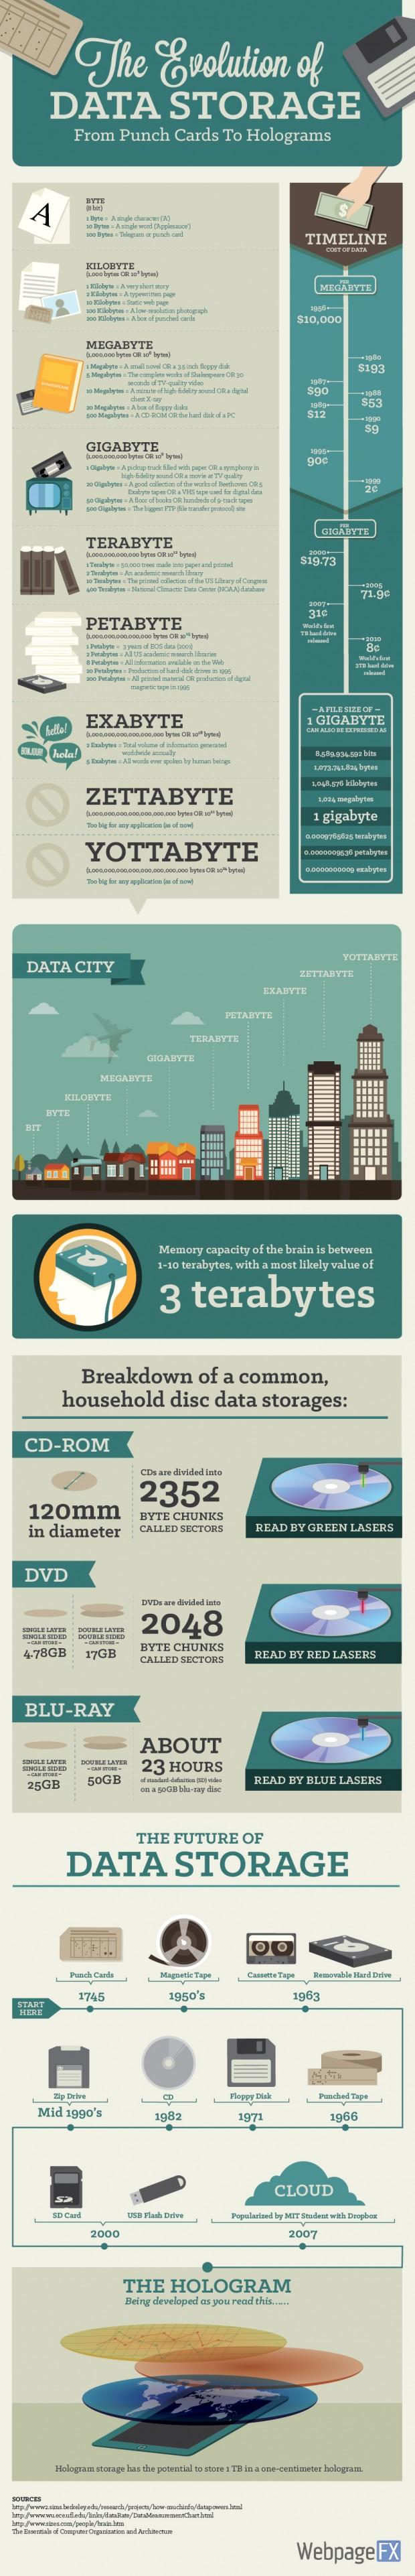 data-storage-infographic